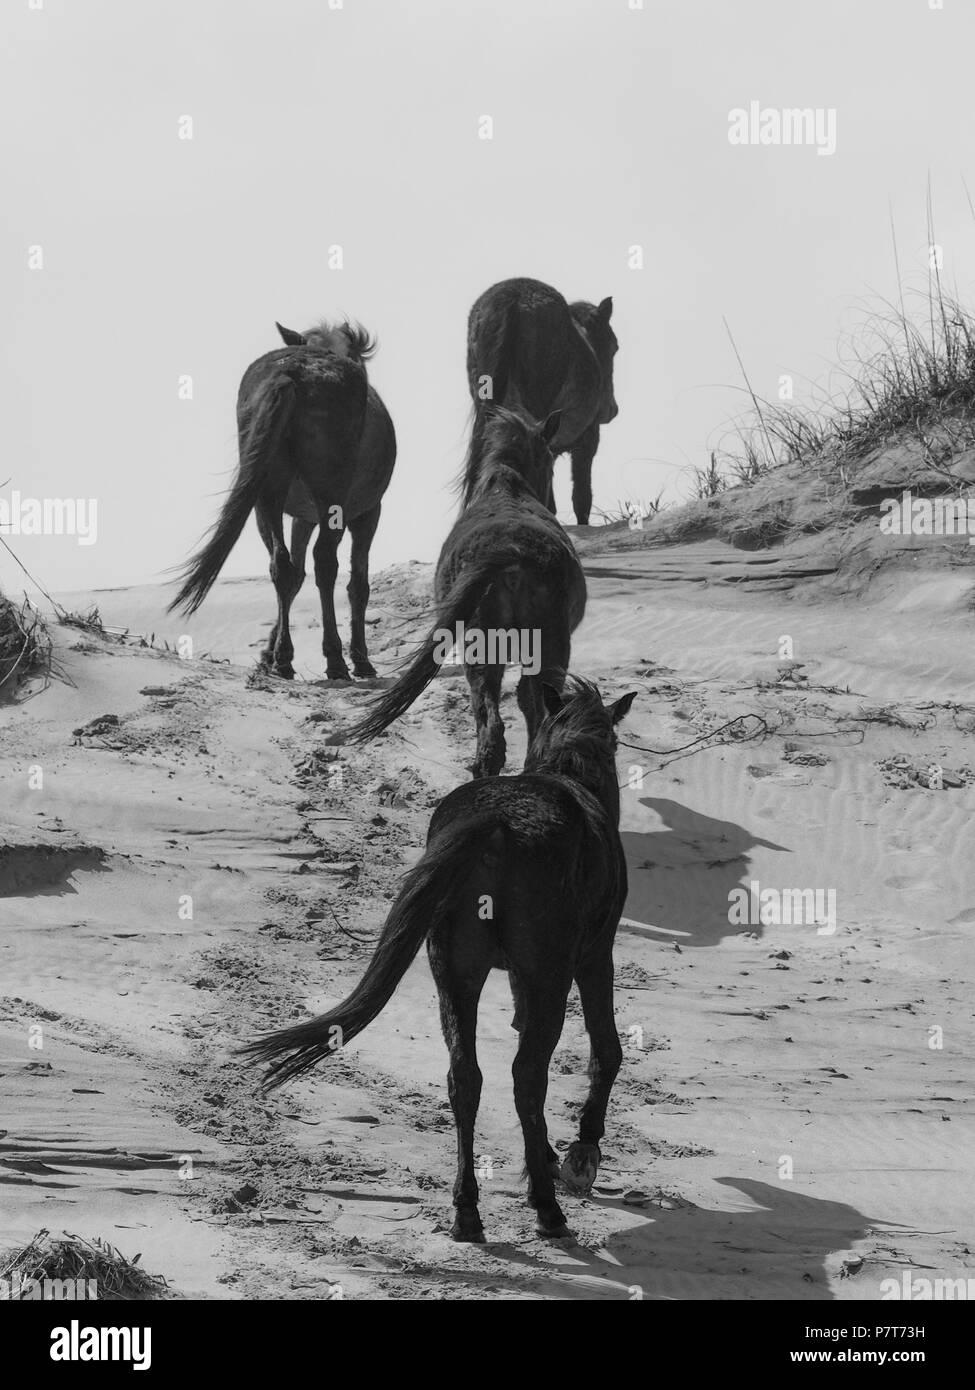 wildhorse corolla obx outer banks nc north carolina free range wild roam beach horses ocean soundfront asateague mustang mare stallion colt pony dunes - Stock Image